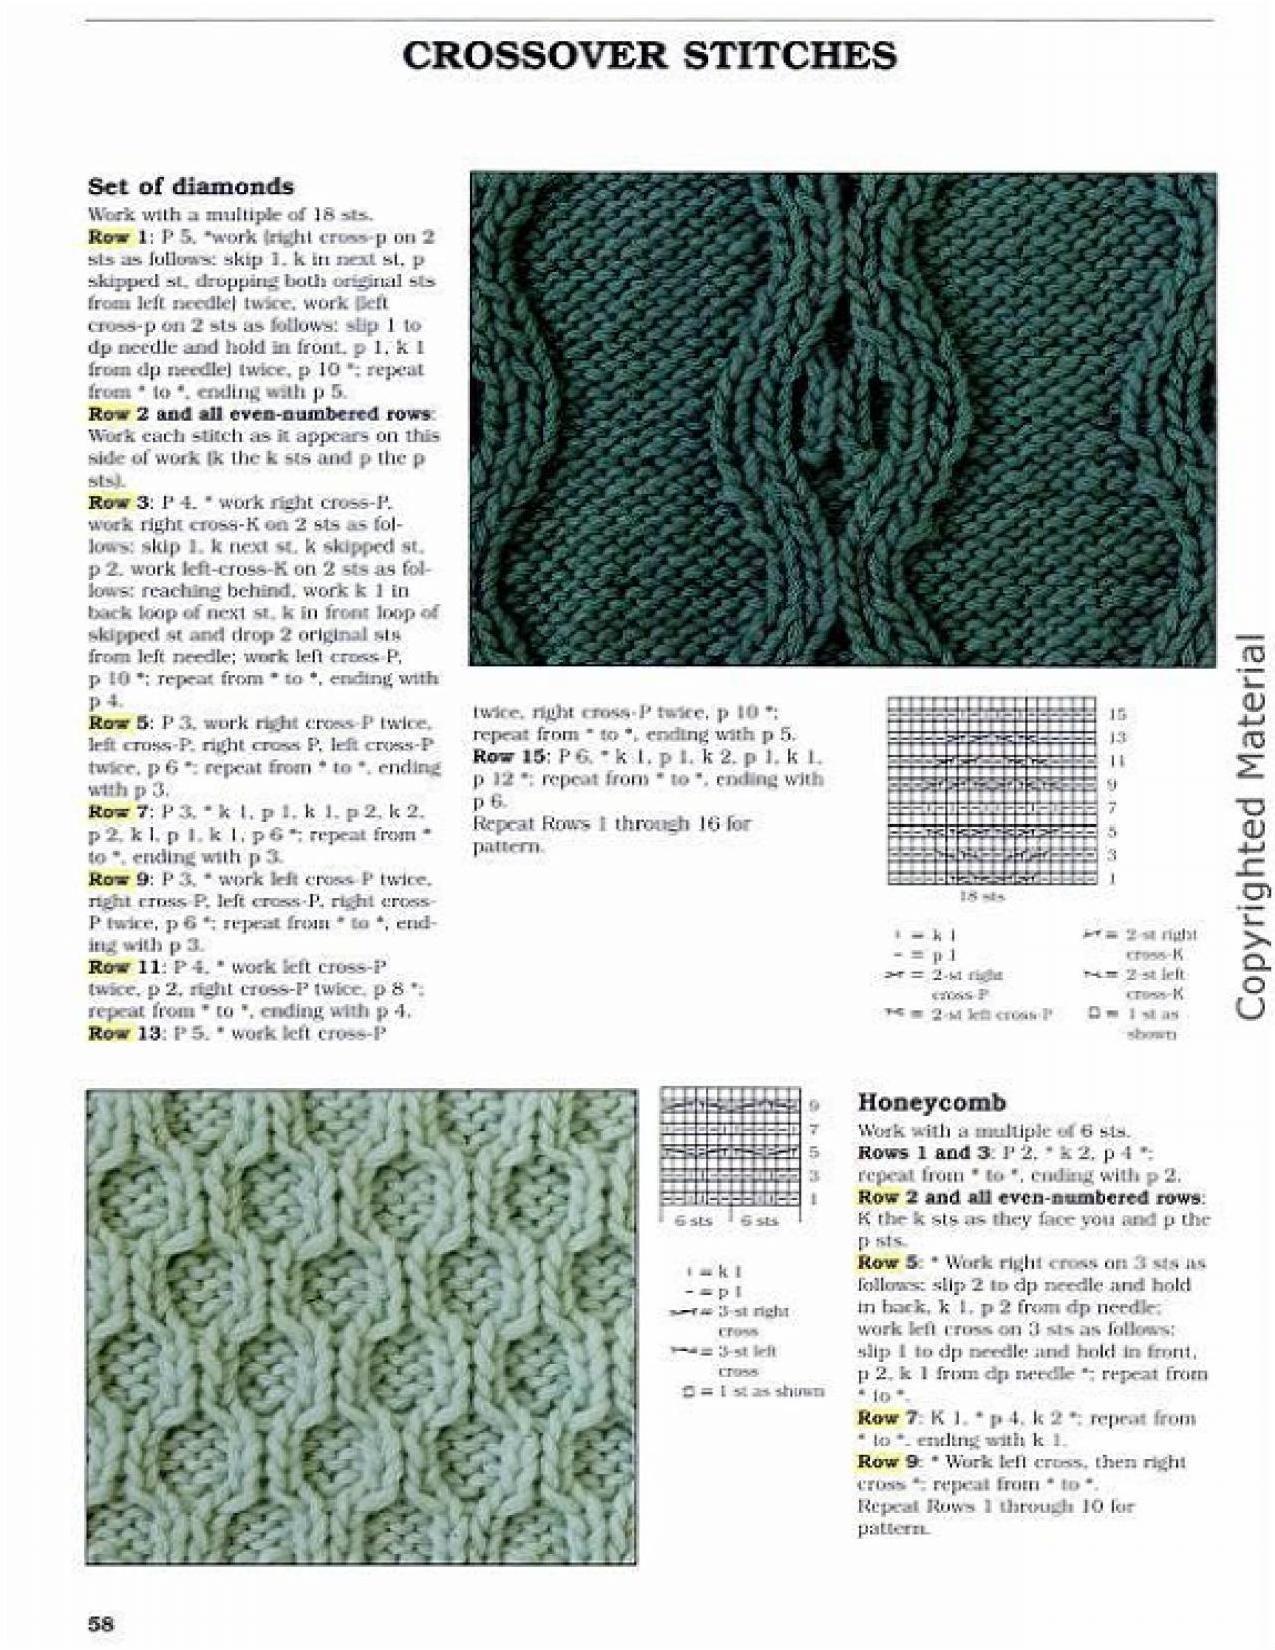 Cable knit patternBig_Book_of_Knitting_Stitch_Patterns_57.jpg ...